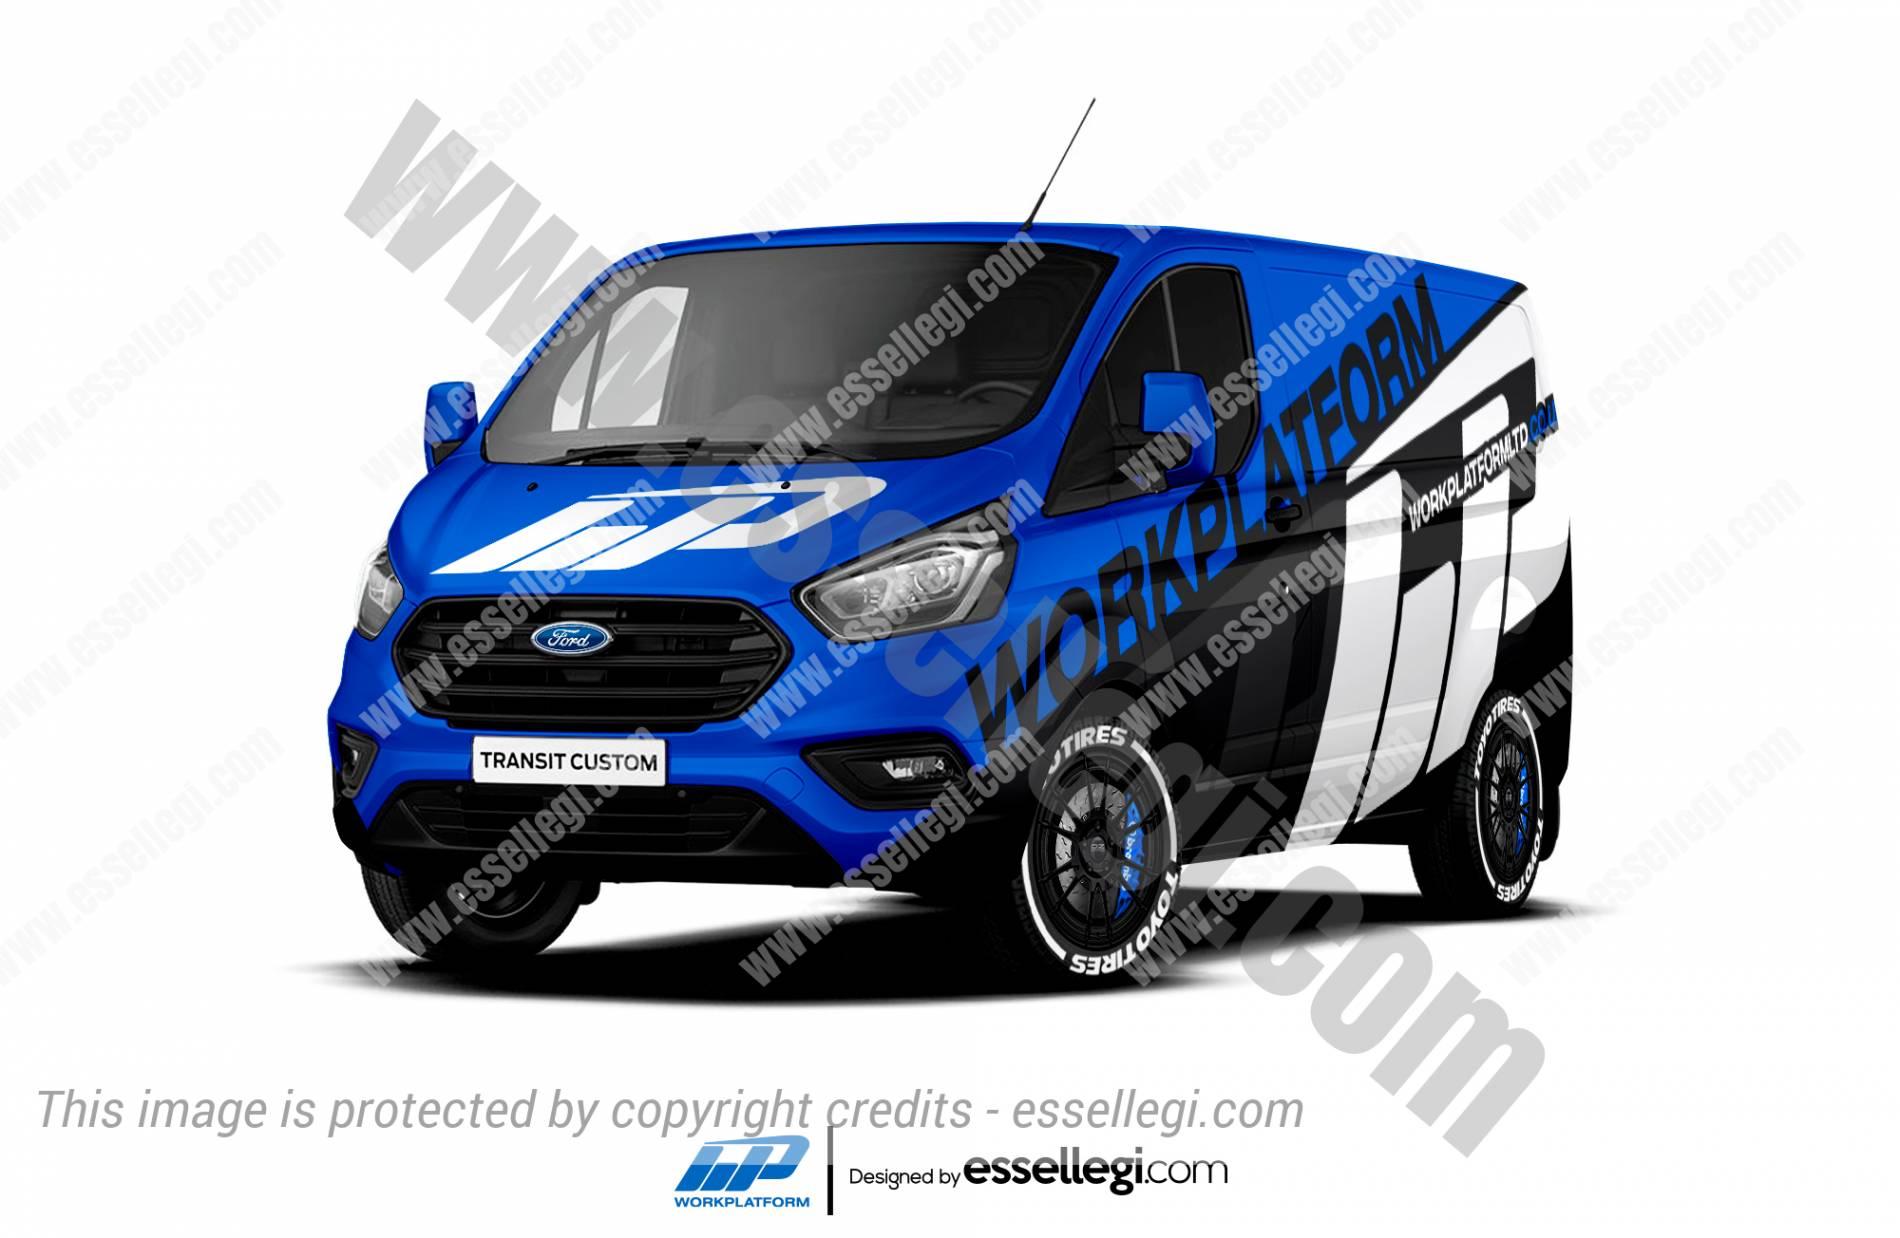 Ford Transit Custom Wrap Design. Ford Transit Custom Wrap | Van Wrap Design by Essellegi. Van Signs, Van Signage, Van Wrapping, Van Signwriting, Van Wrap Designer, Signs for Van, Van Logo, Van Graphic by Essellegi.